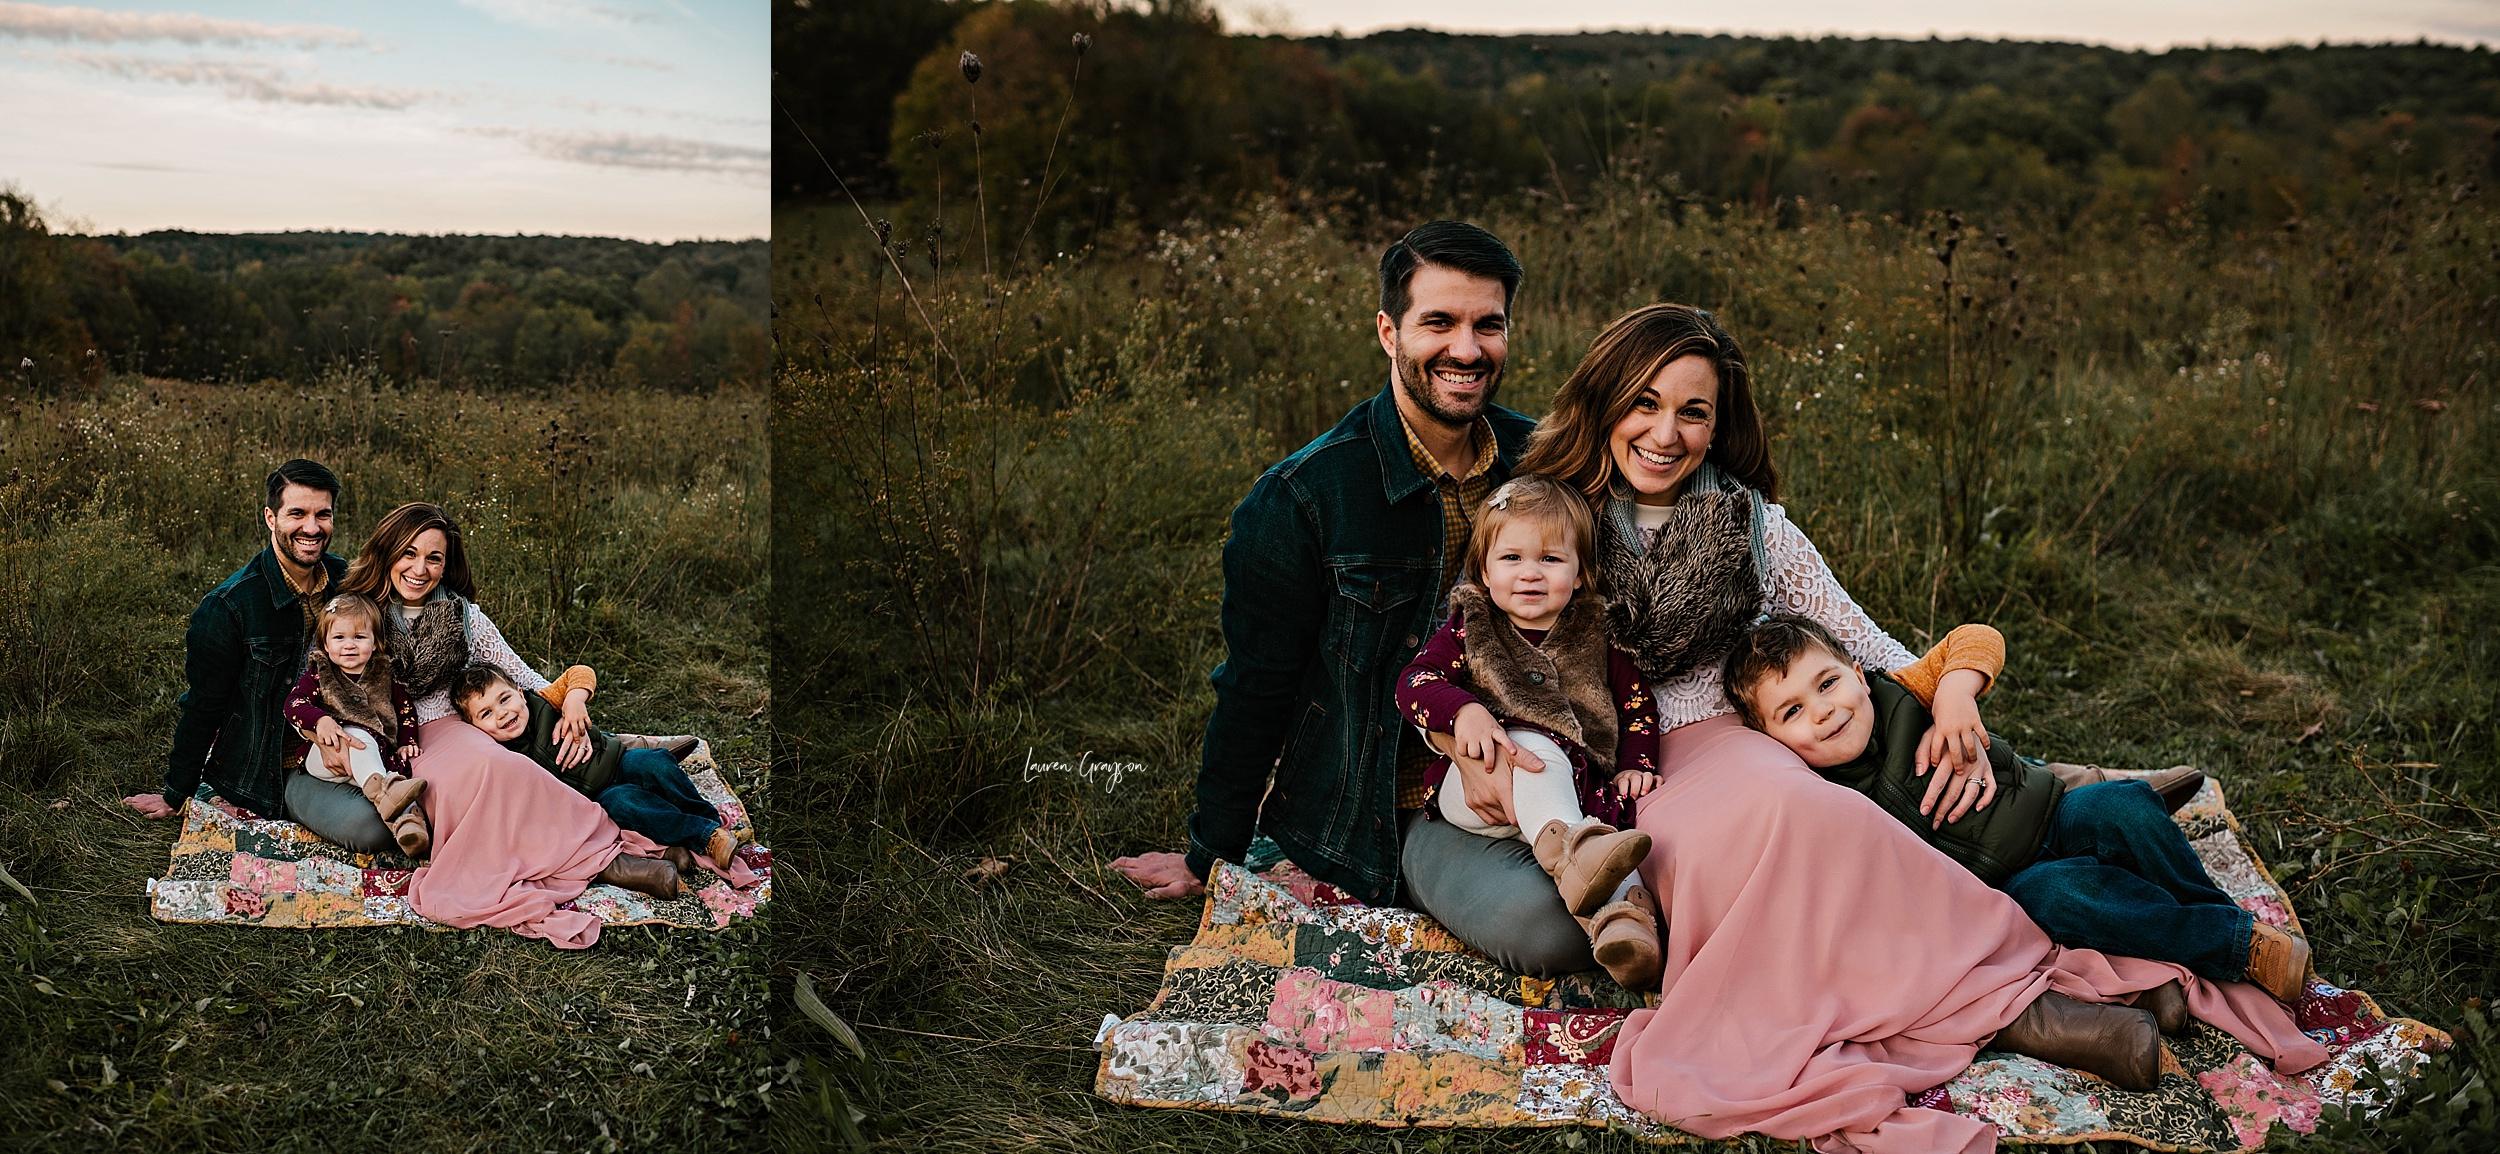 lauren-grayson-photography-akron-photographer-family-carro_0991.jpg